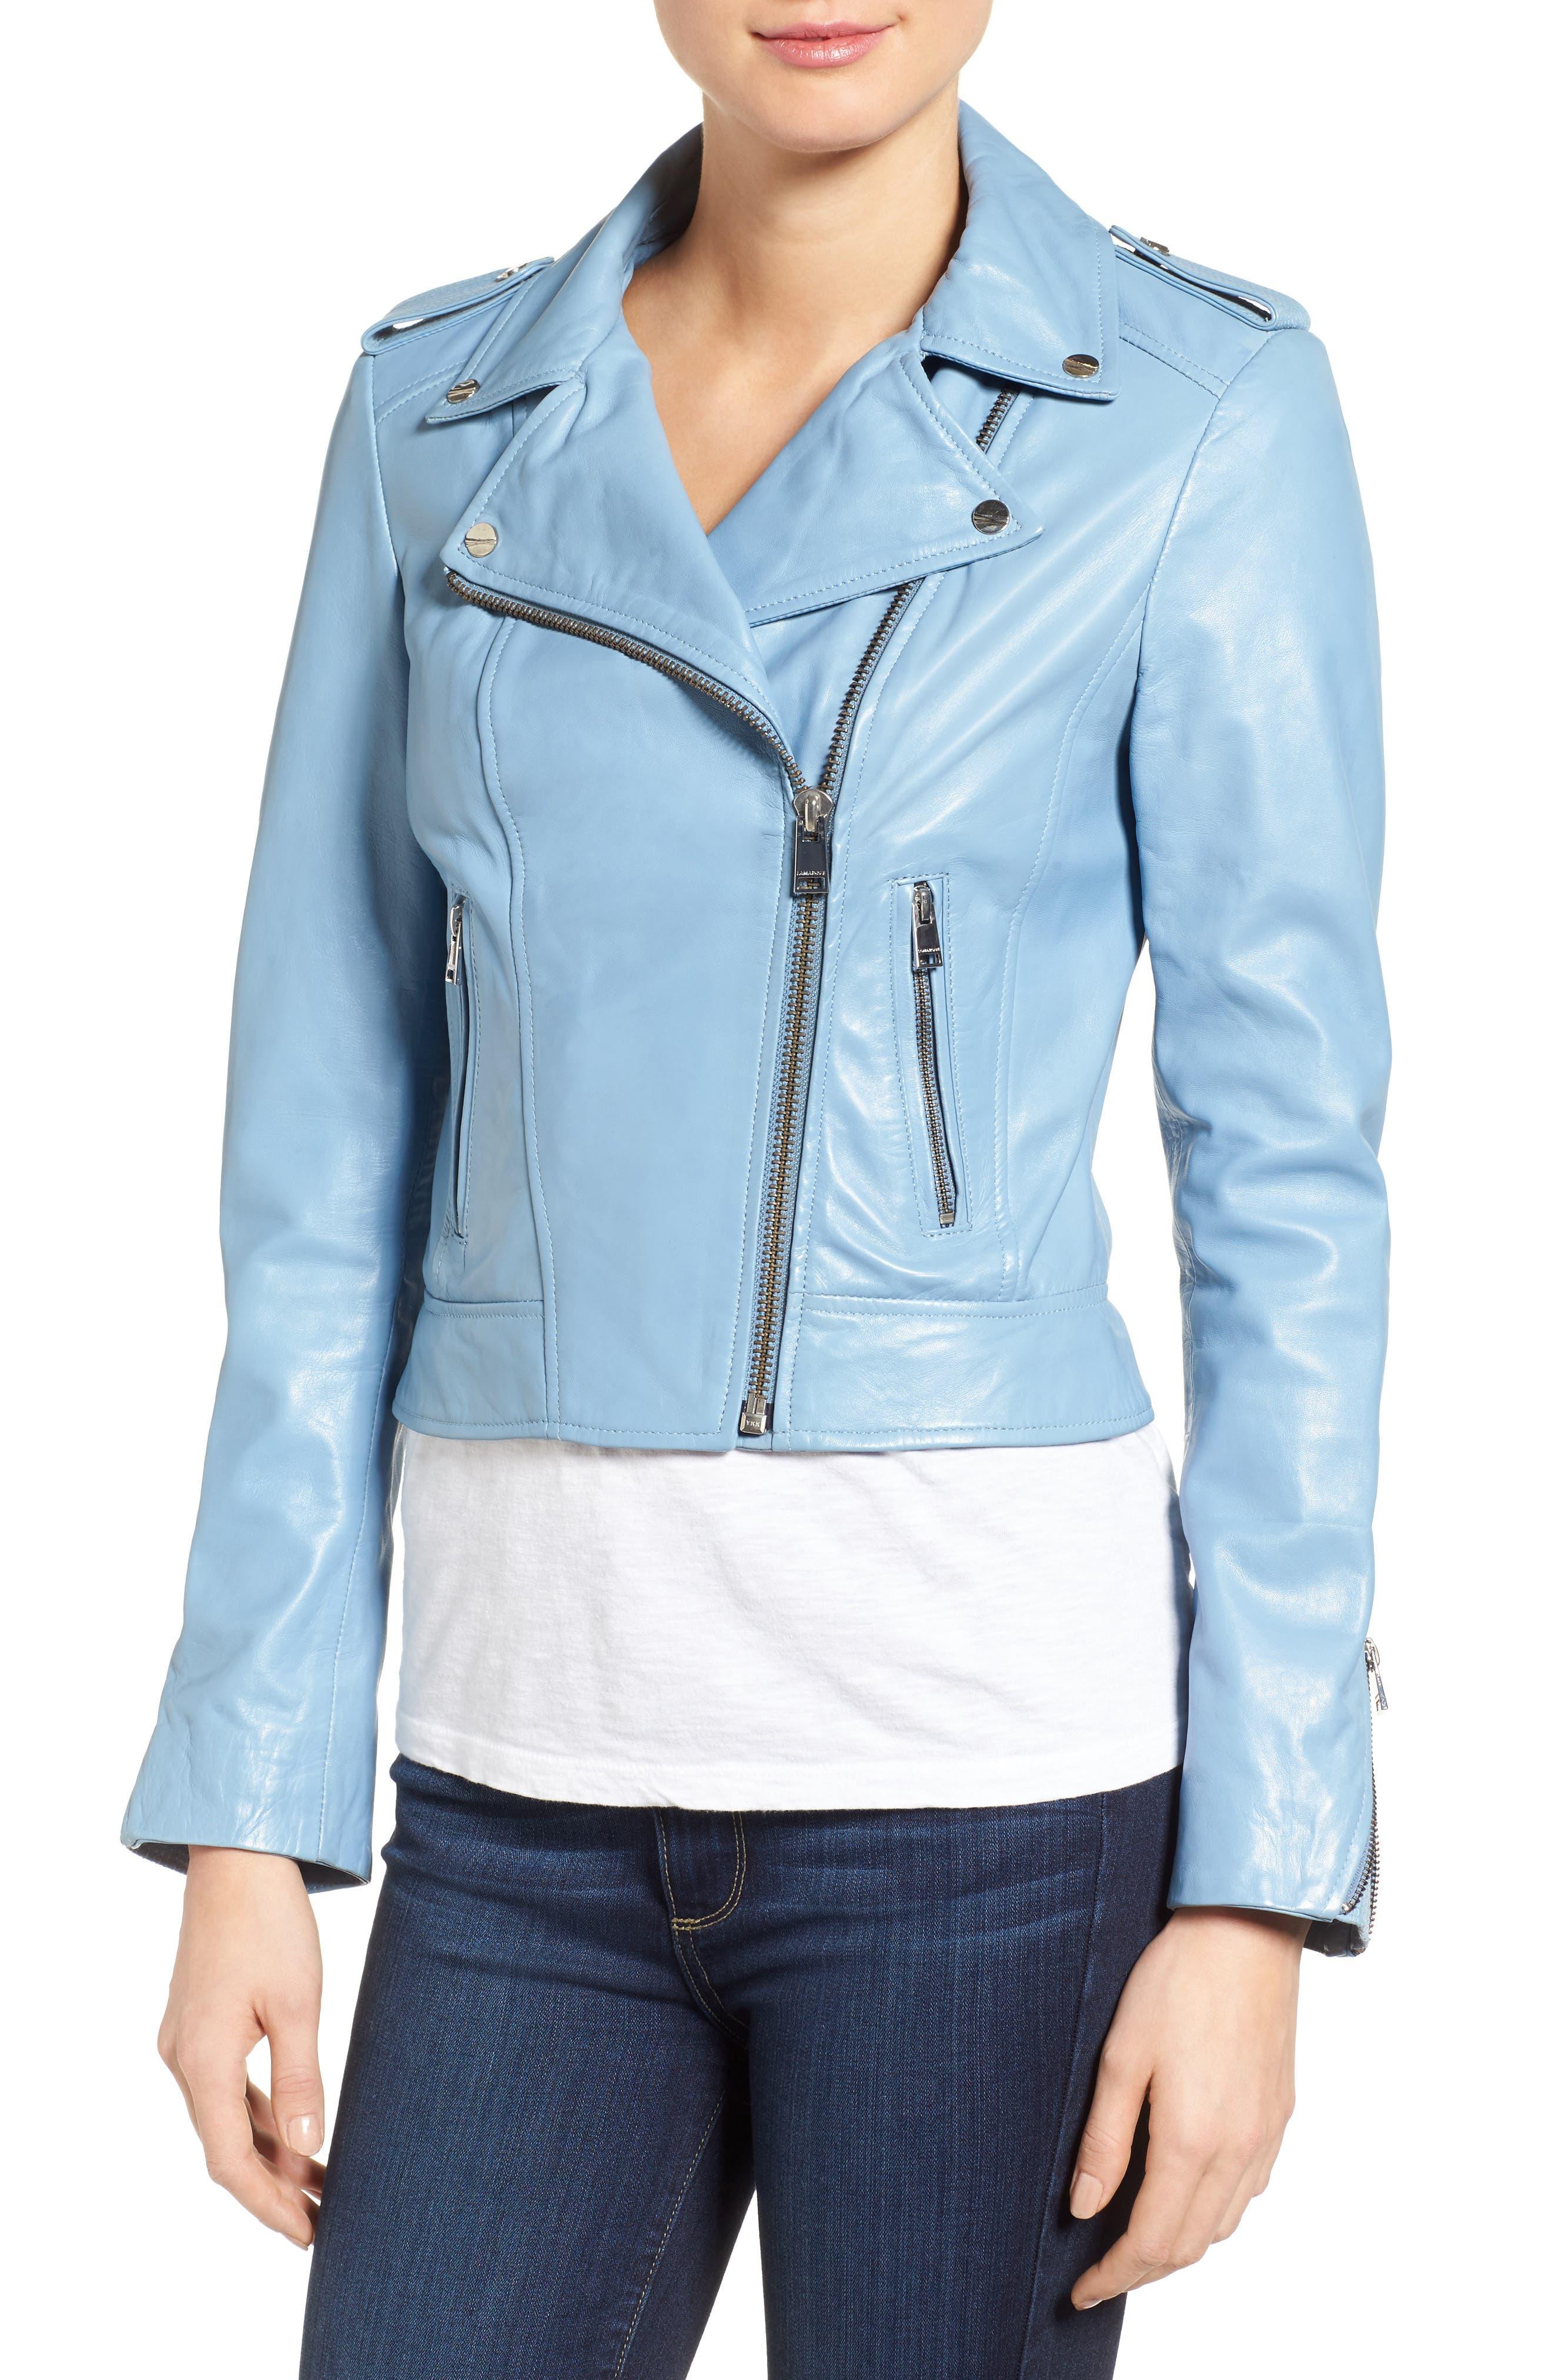 Donna Lambskin Leather Moto Jacket,                             Alternate thumbnail 4, color,                             POWDER BLUE